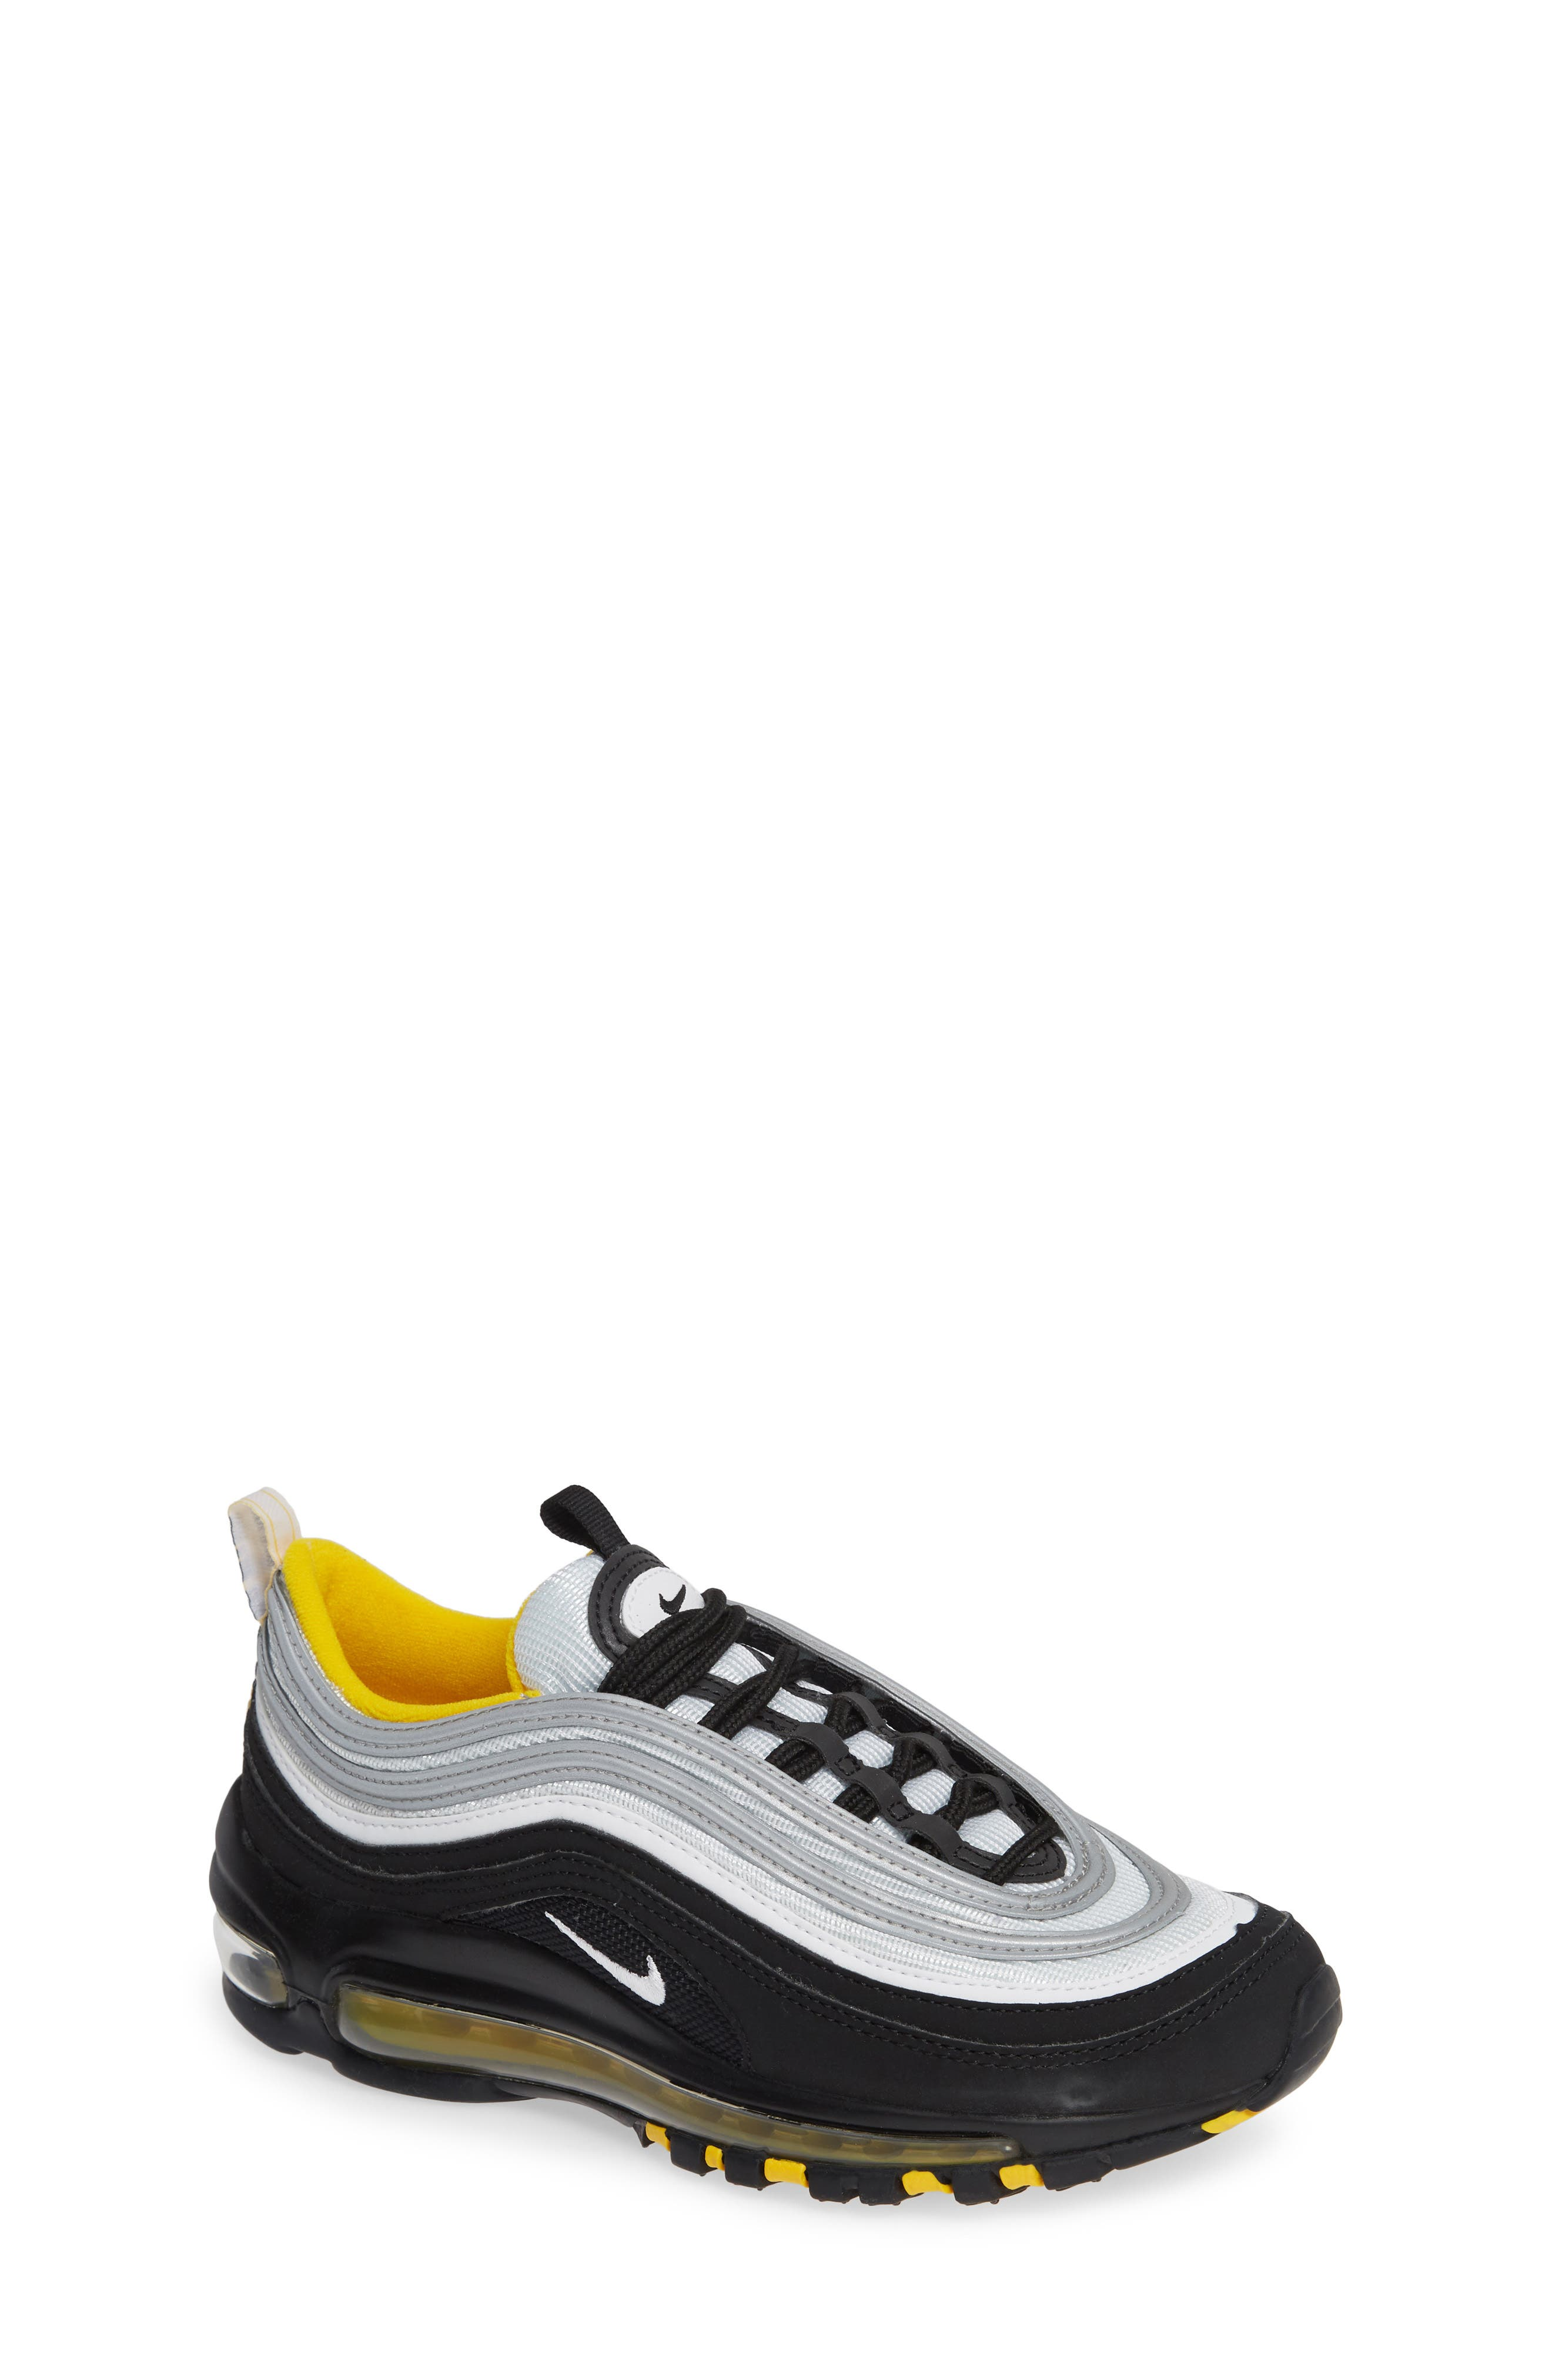 Air Max 97 Sneaker,                             Main thumbnail 1, color,                             BLACK/ WHITE/ AMARILLO